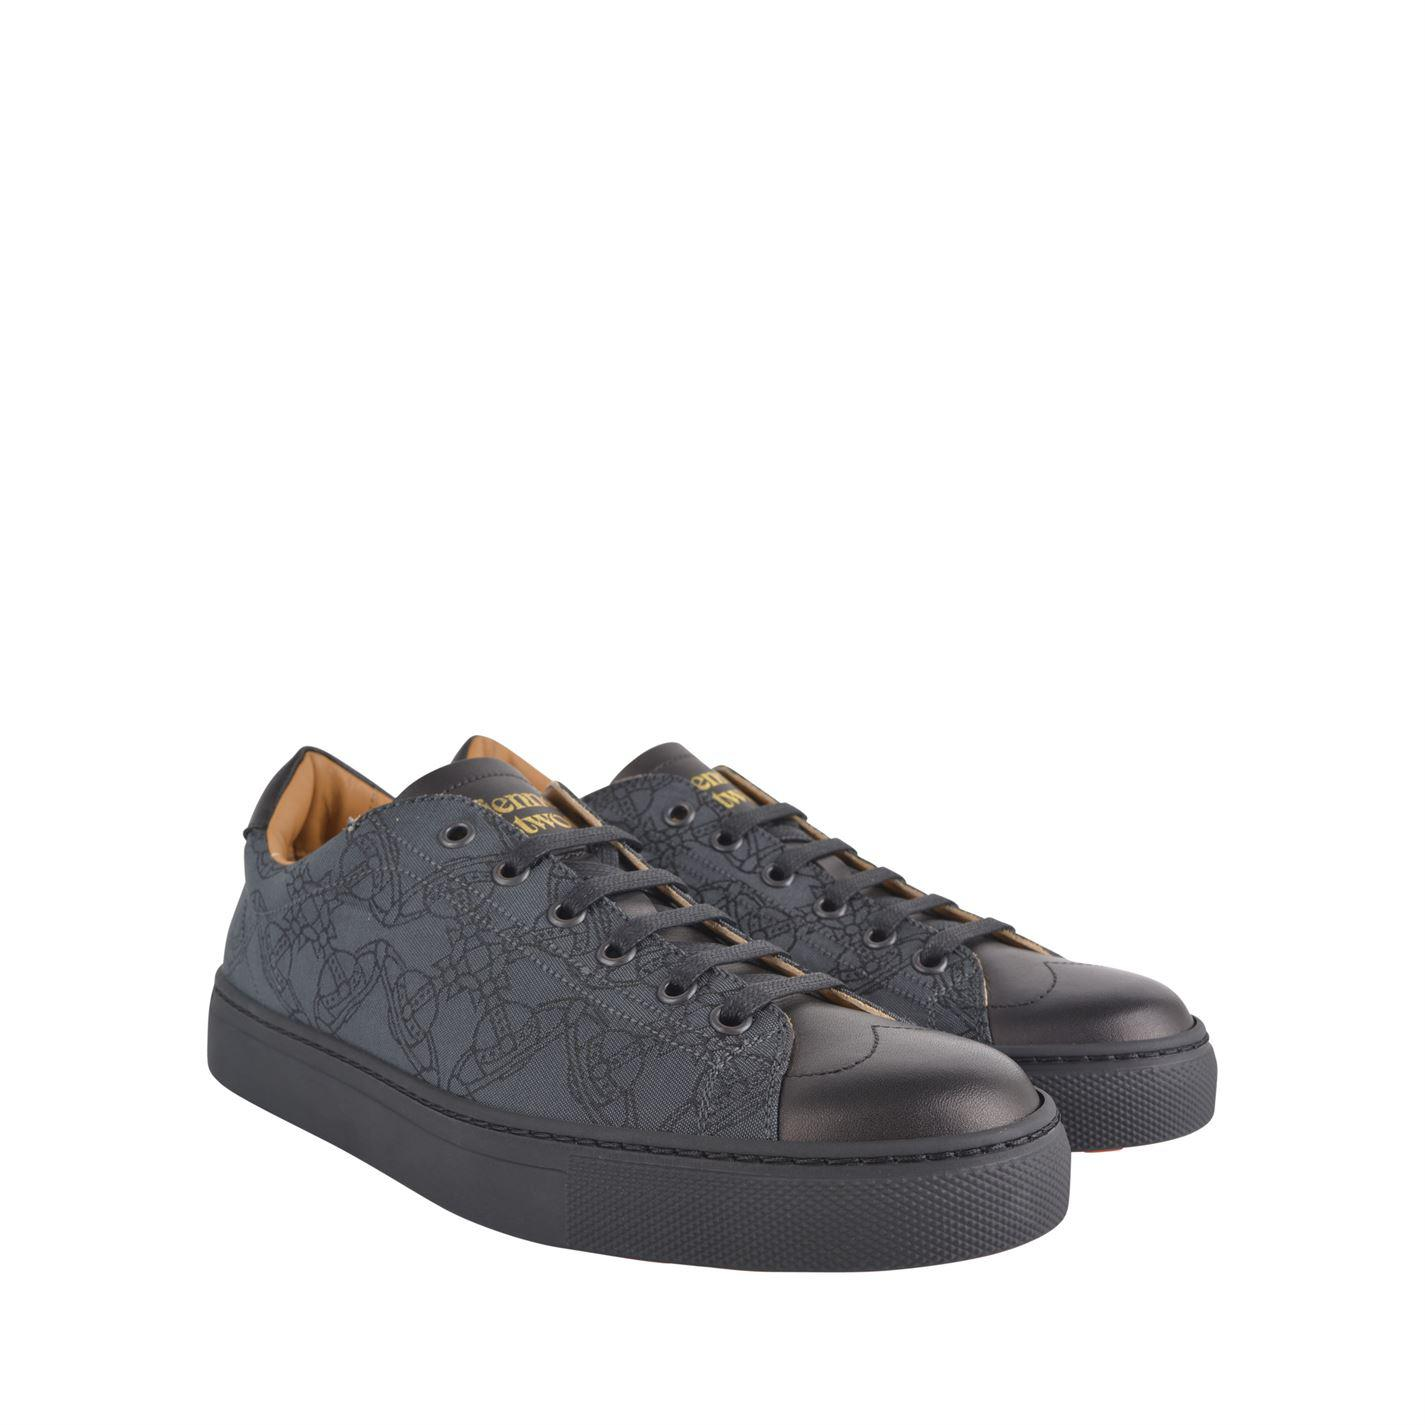 Vivienne Westwood Leather Jacquard